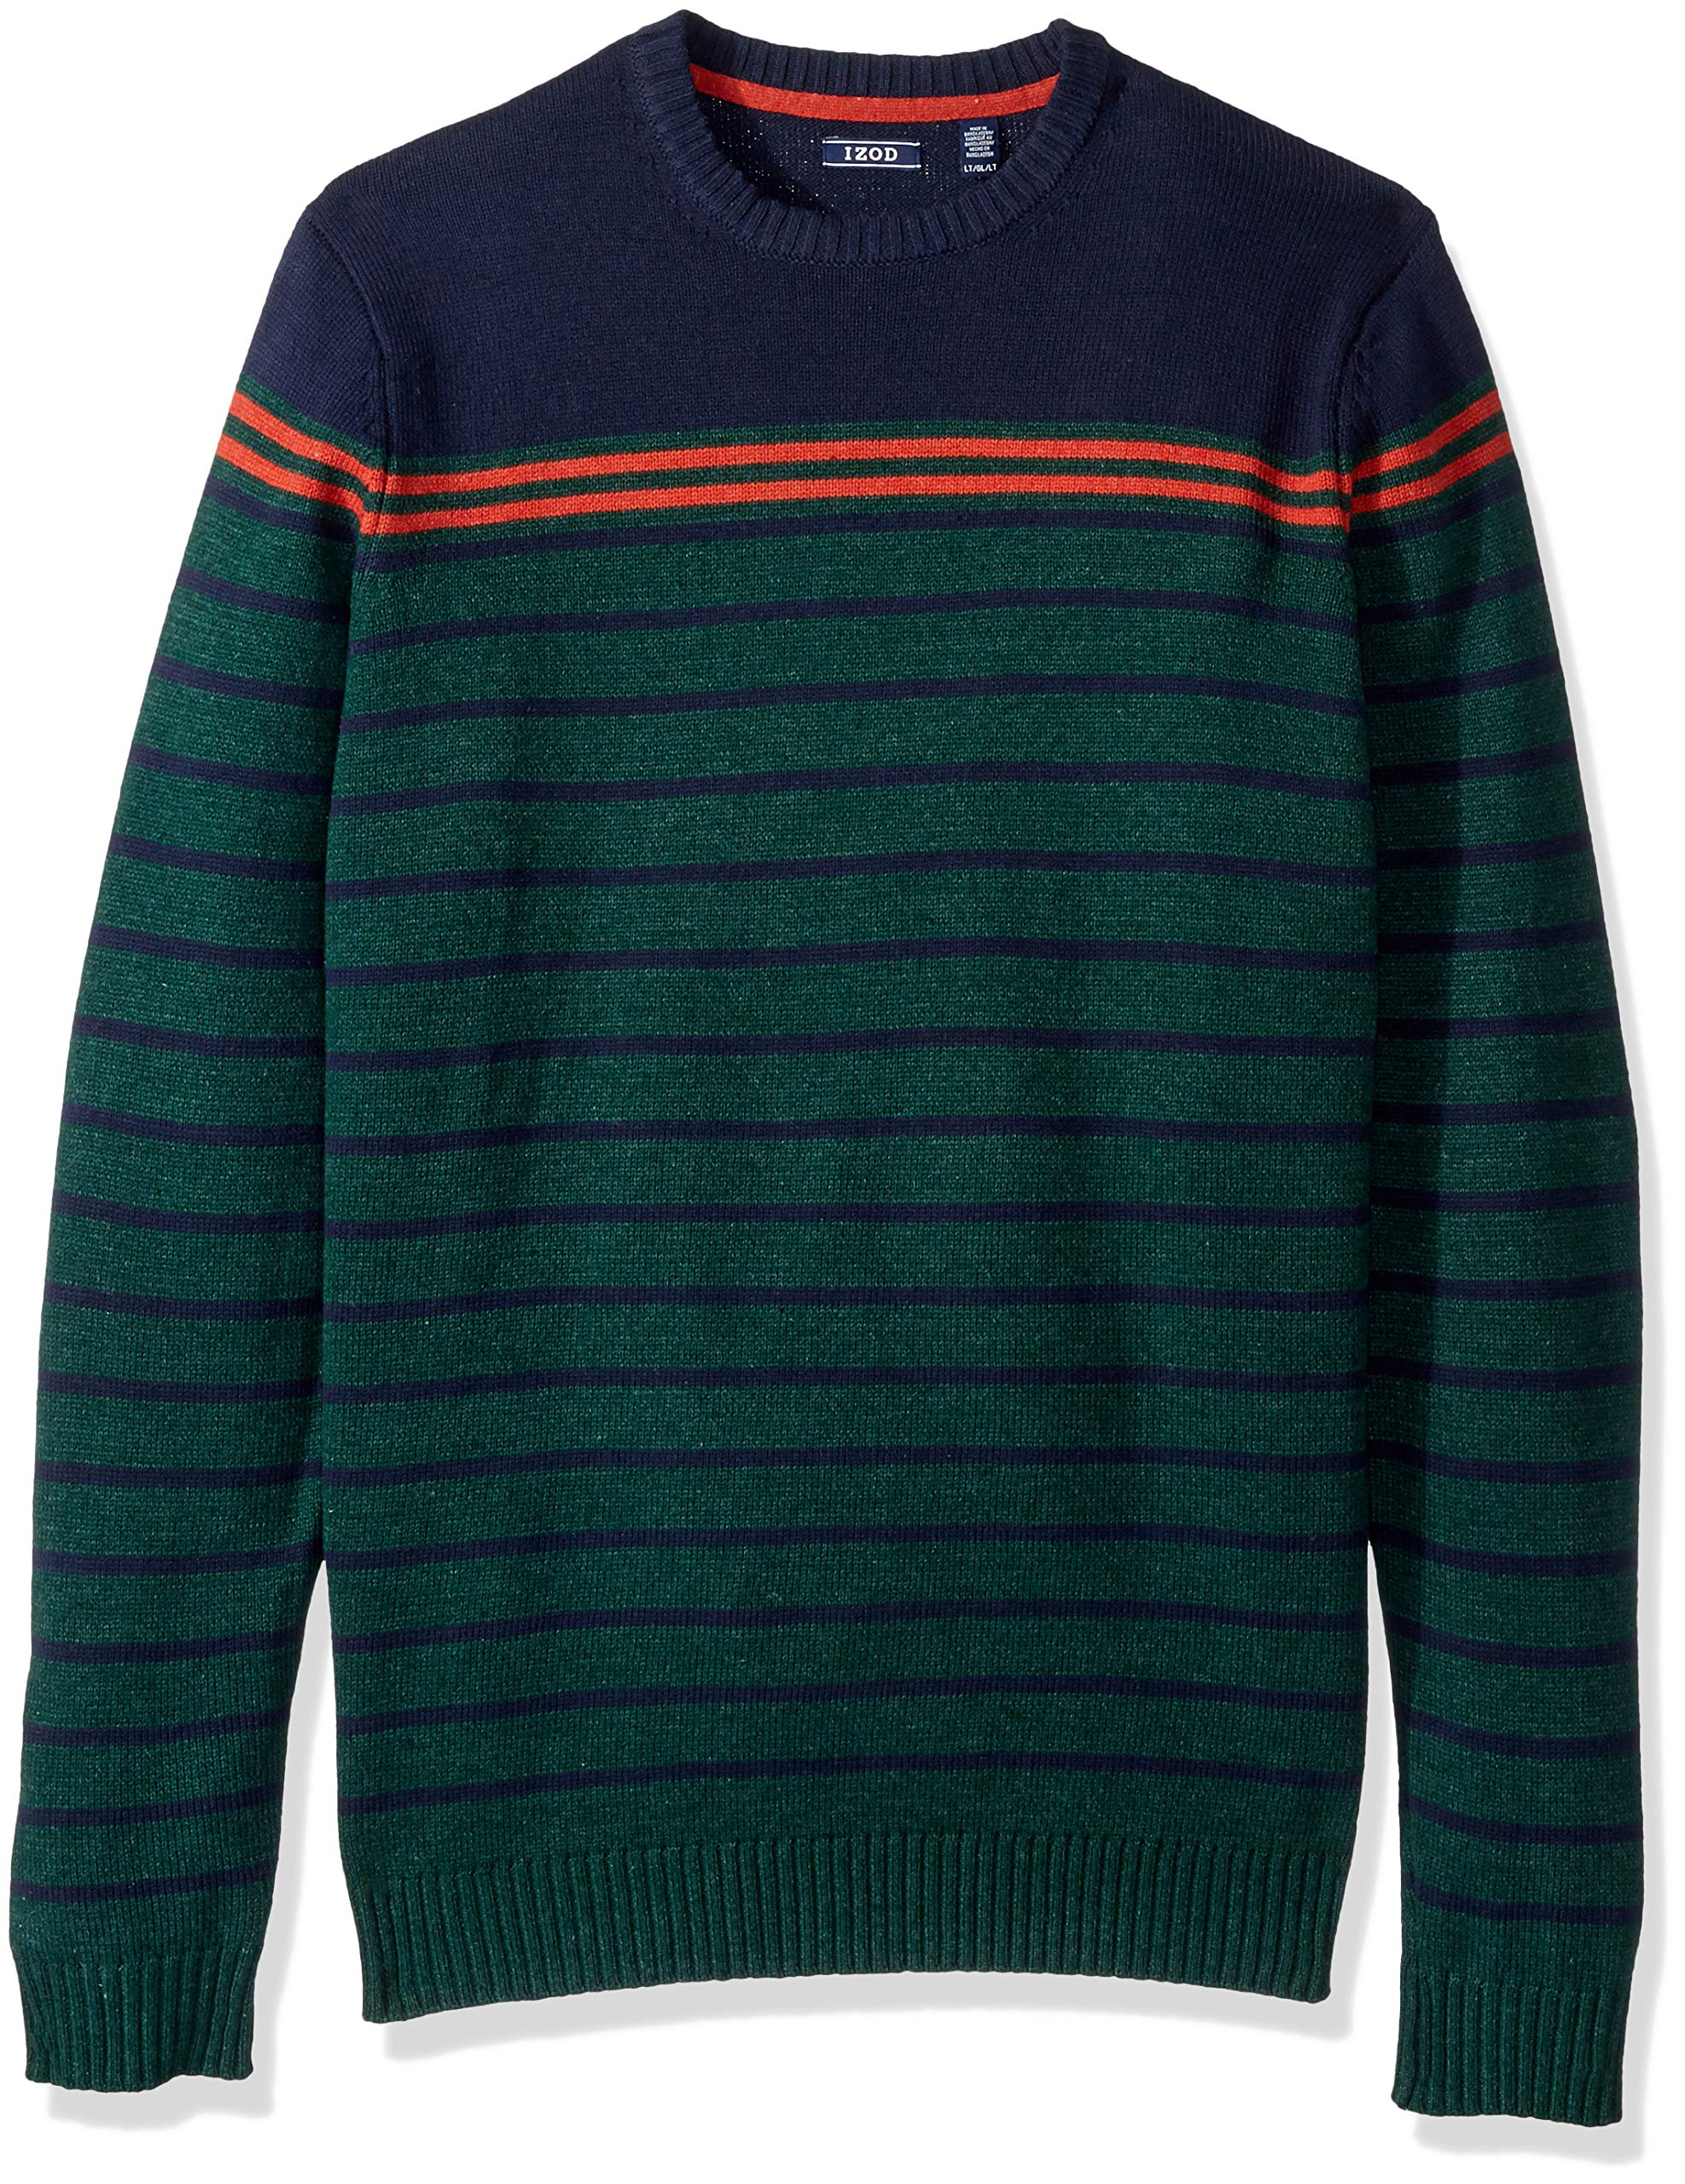 IZOD Men's Big and Tall Stripe 7 Gauge Crewneck Sweater, Bot Garden, 3X-Large